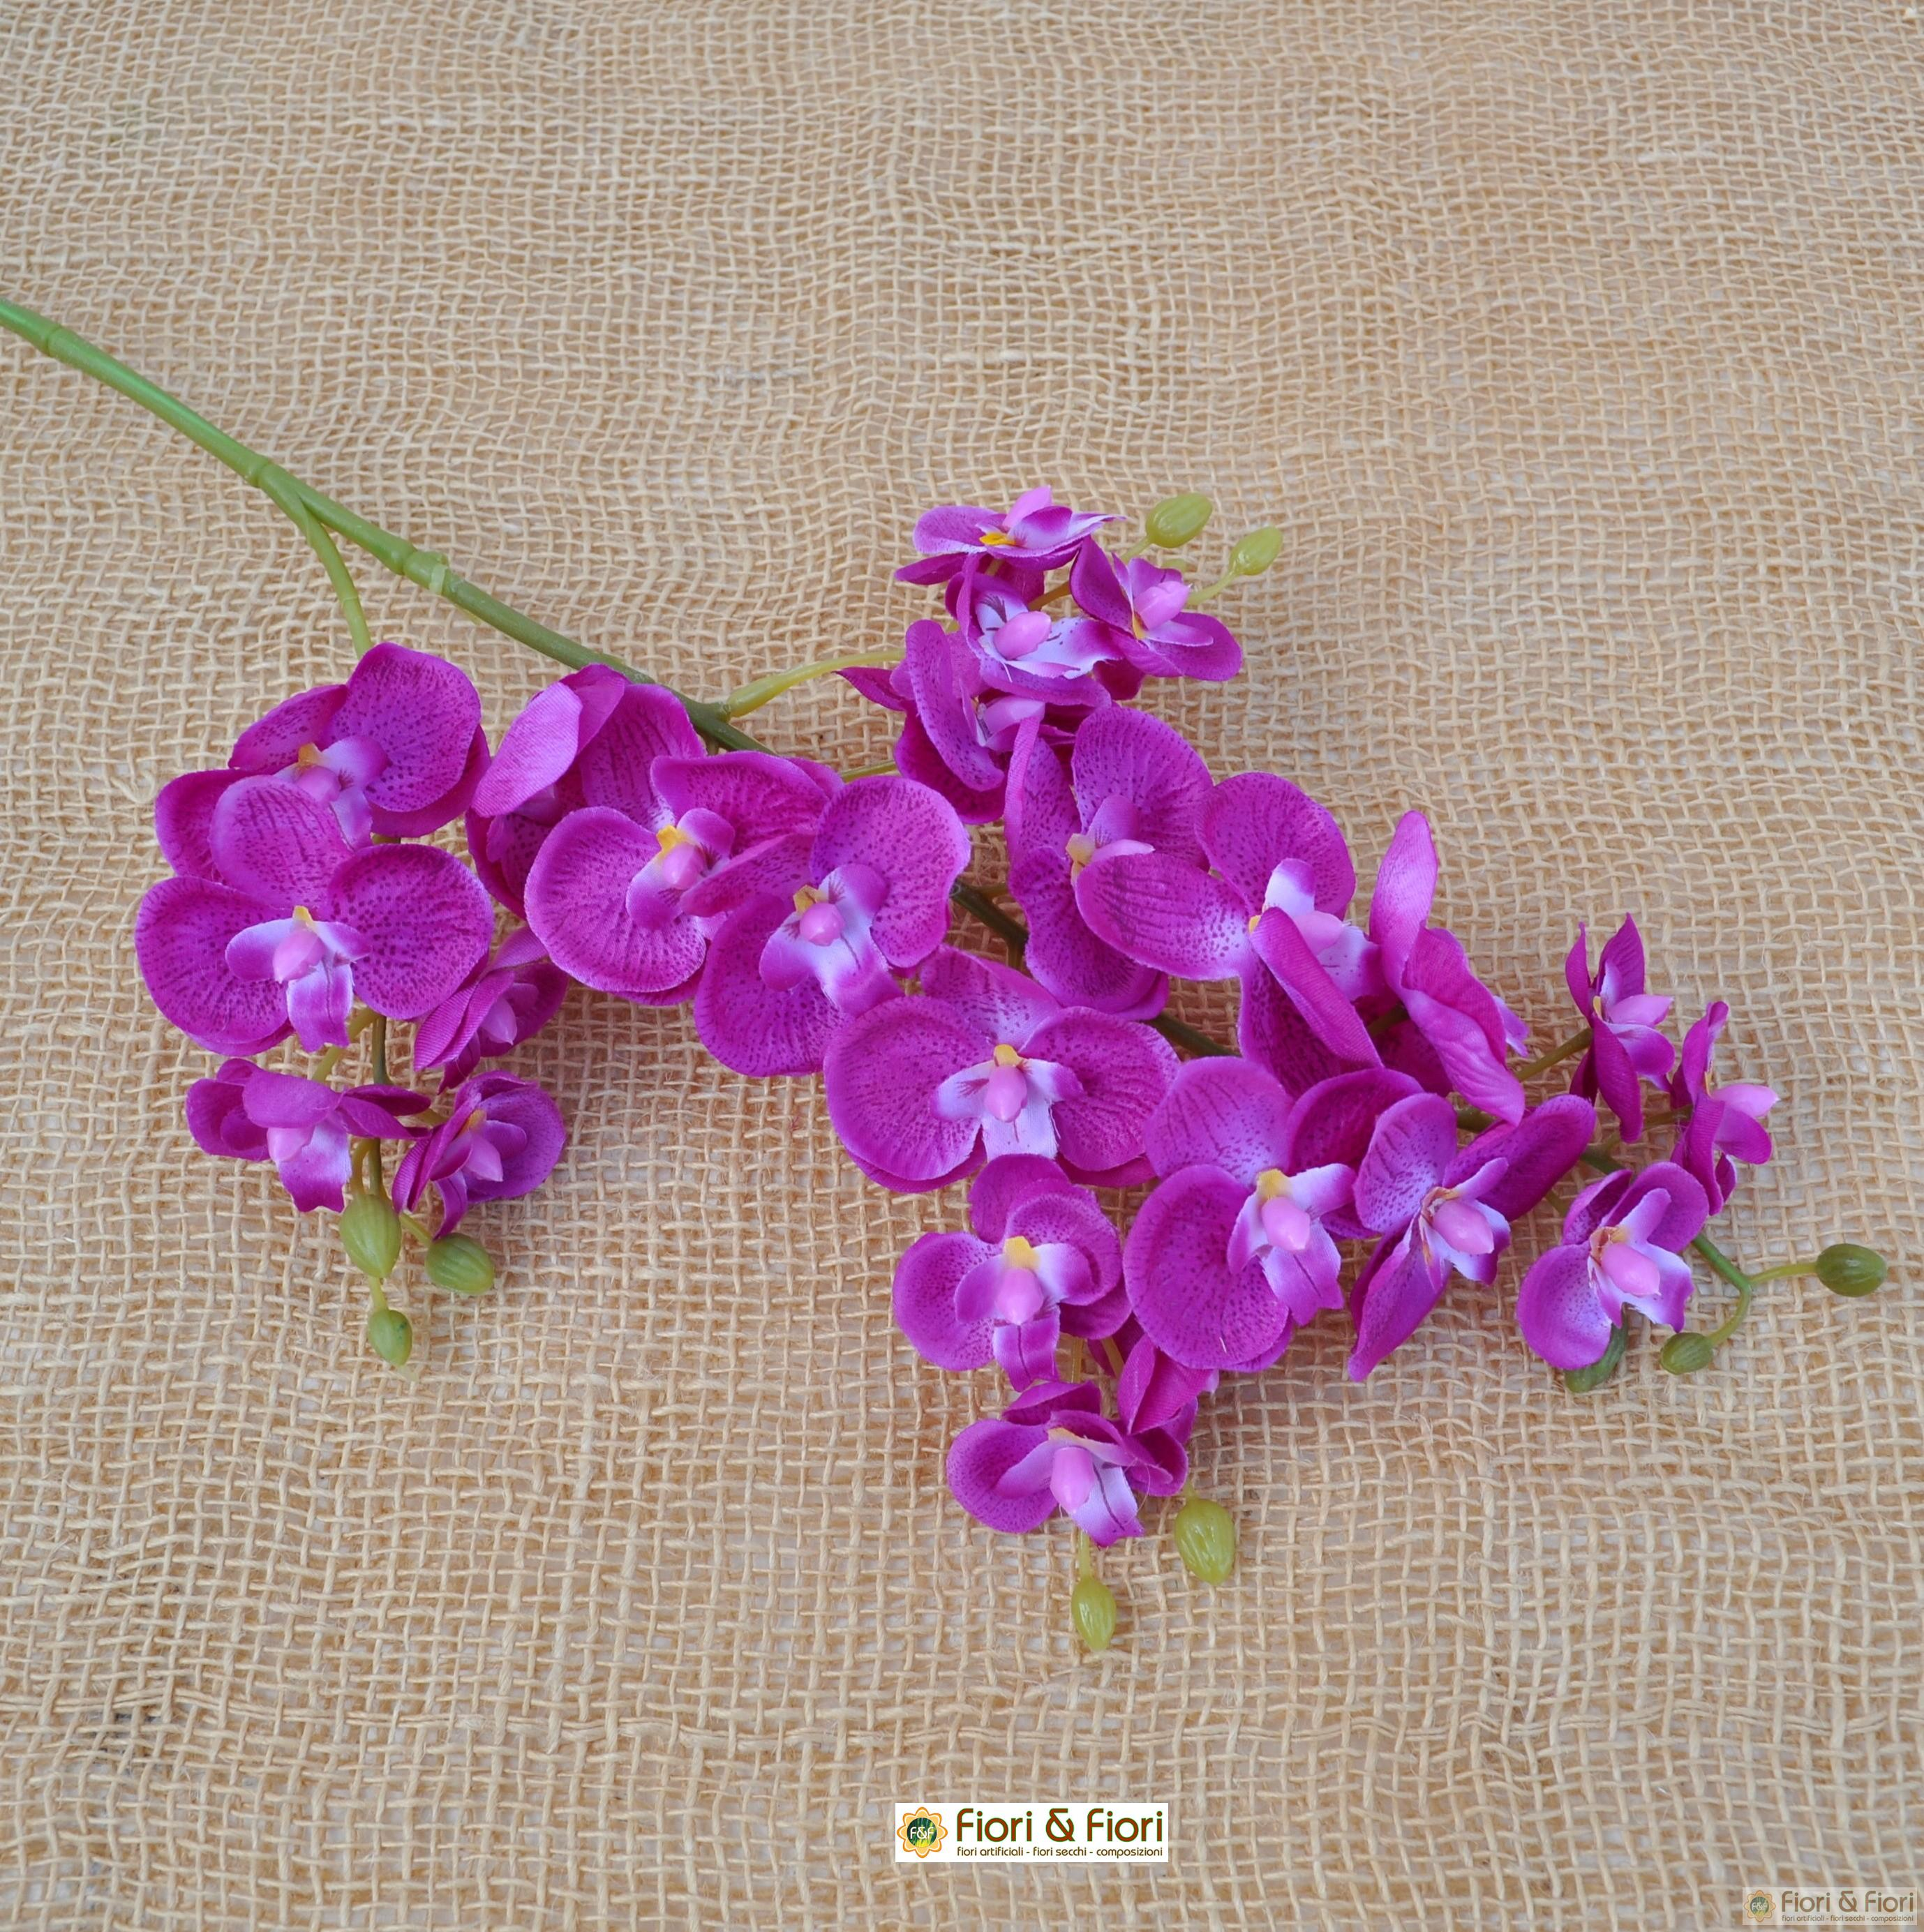 Fiore finto di orchidea phalaenopsis amabilis fucsia for Orchidea finta